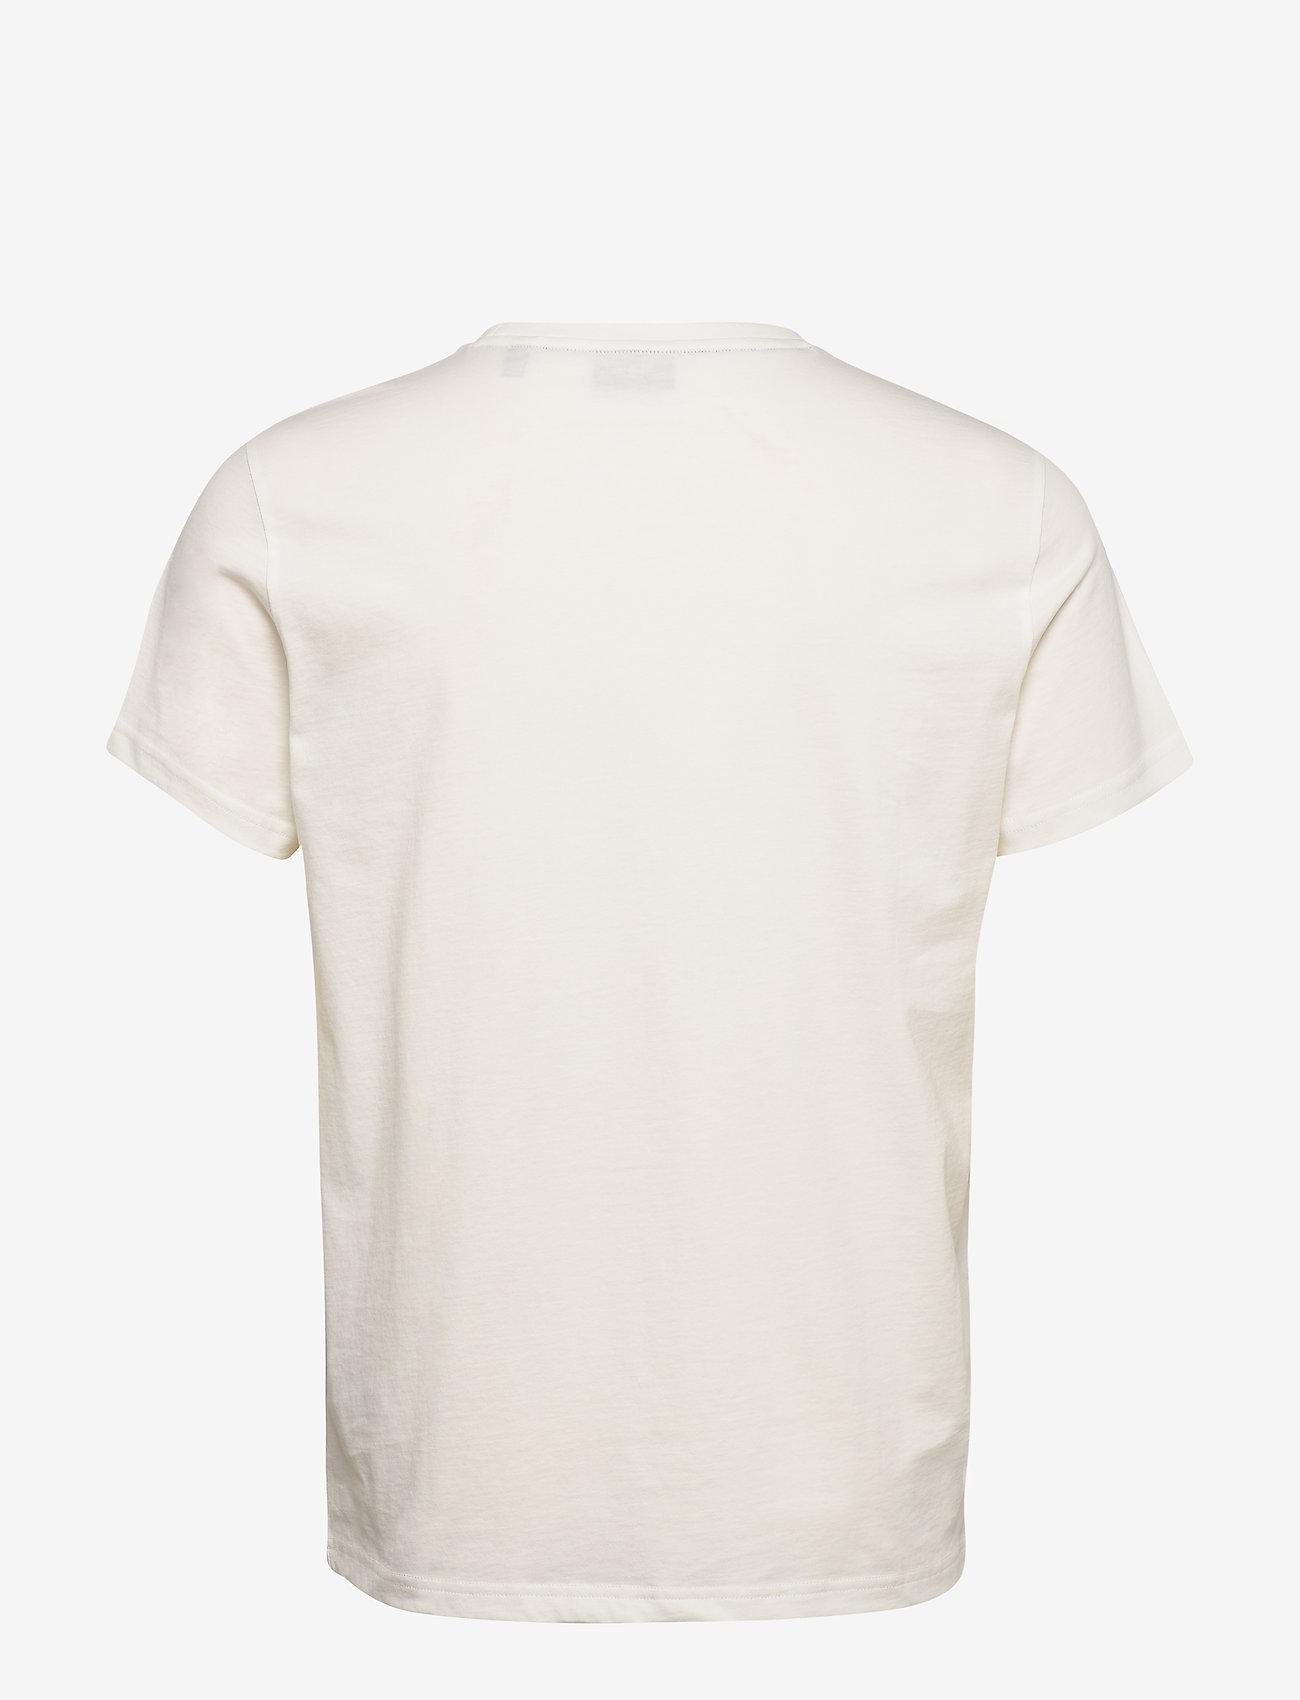 GANT - D1. COLOR LOCK UP SS T-SHIRT - short-sleeved t-shirts - eggshell - 1